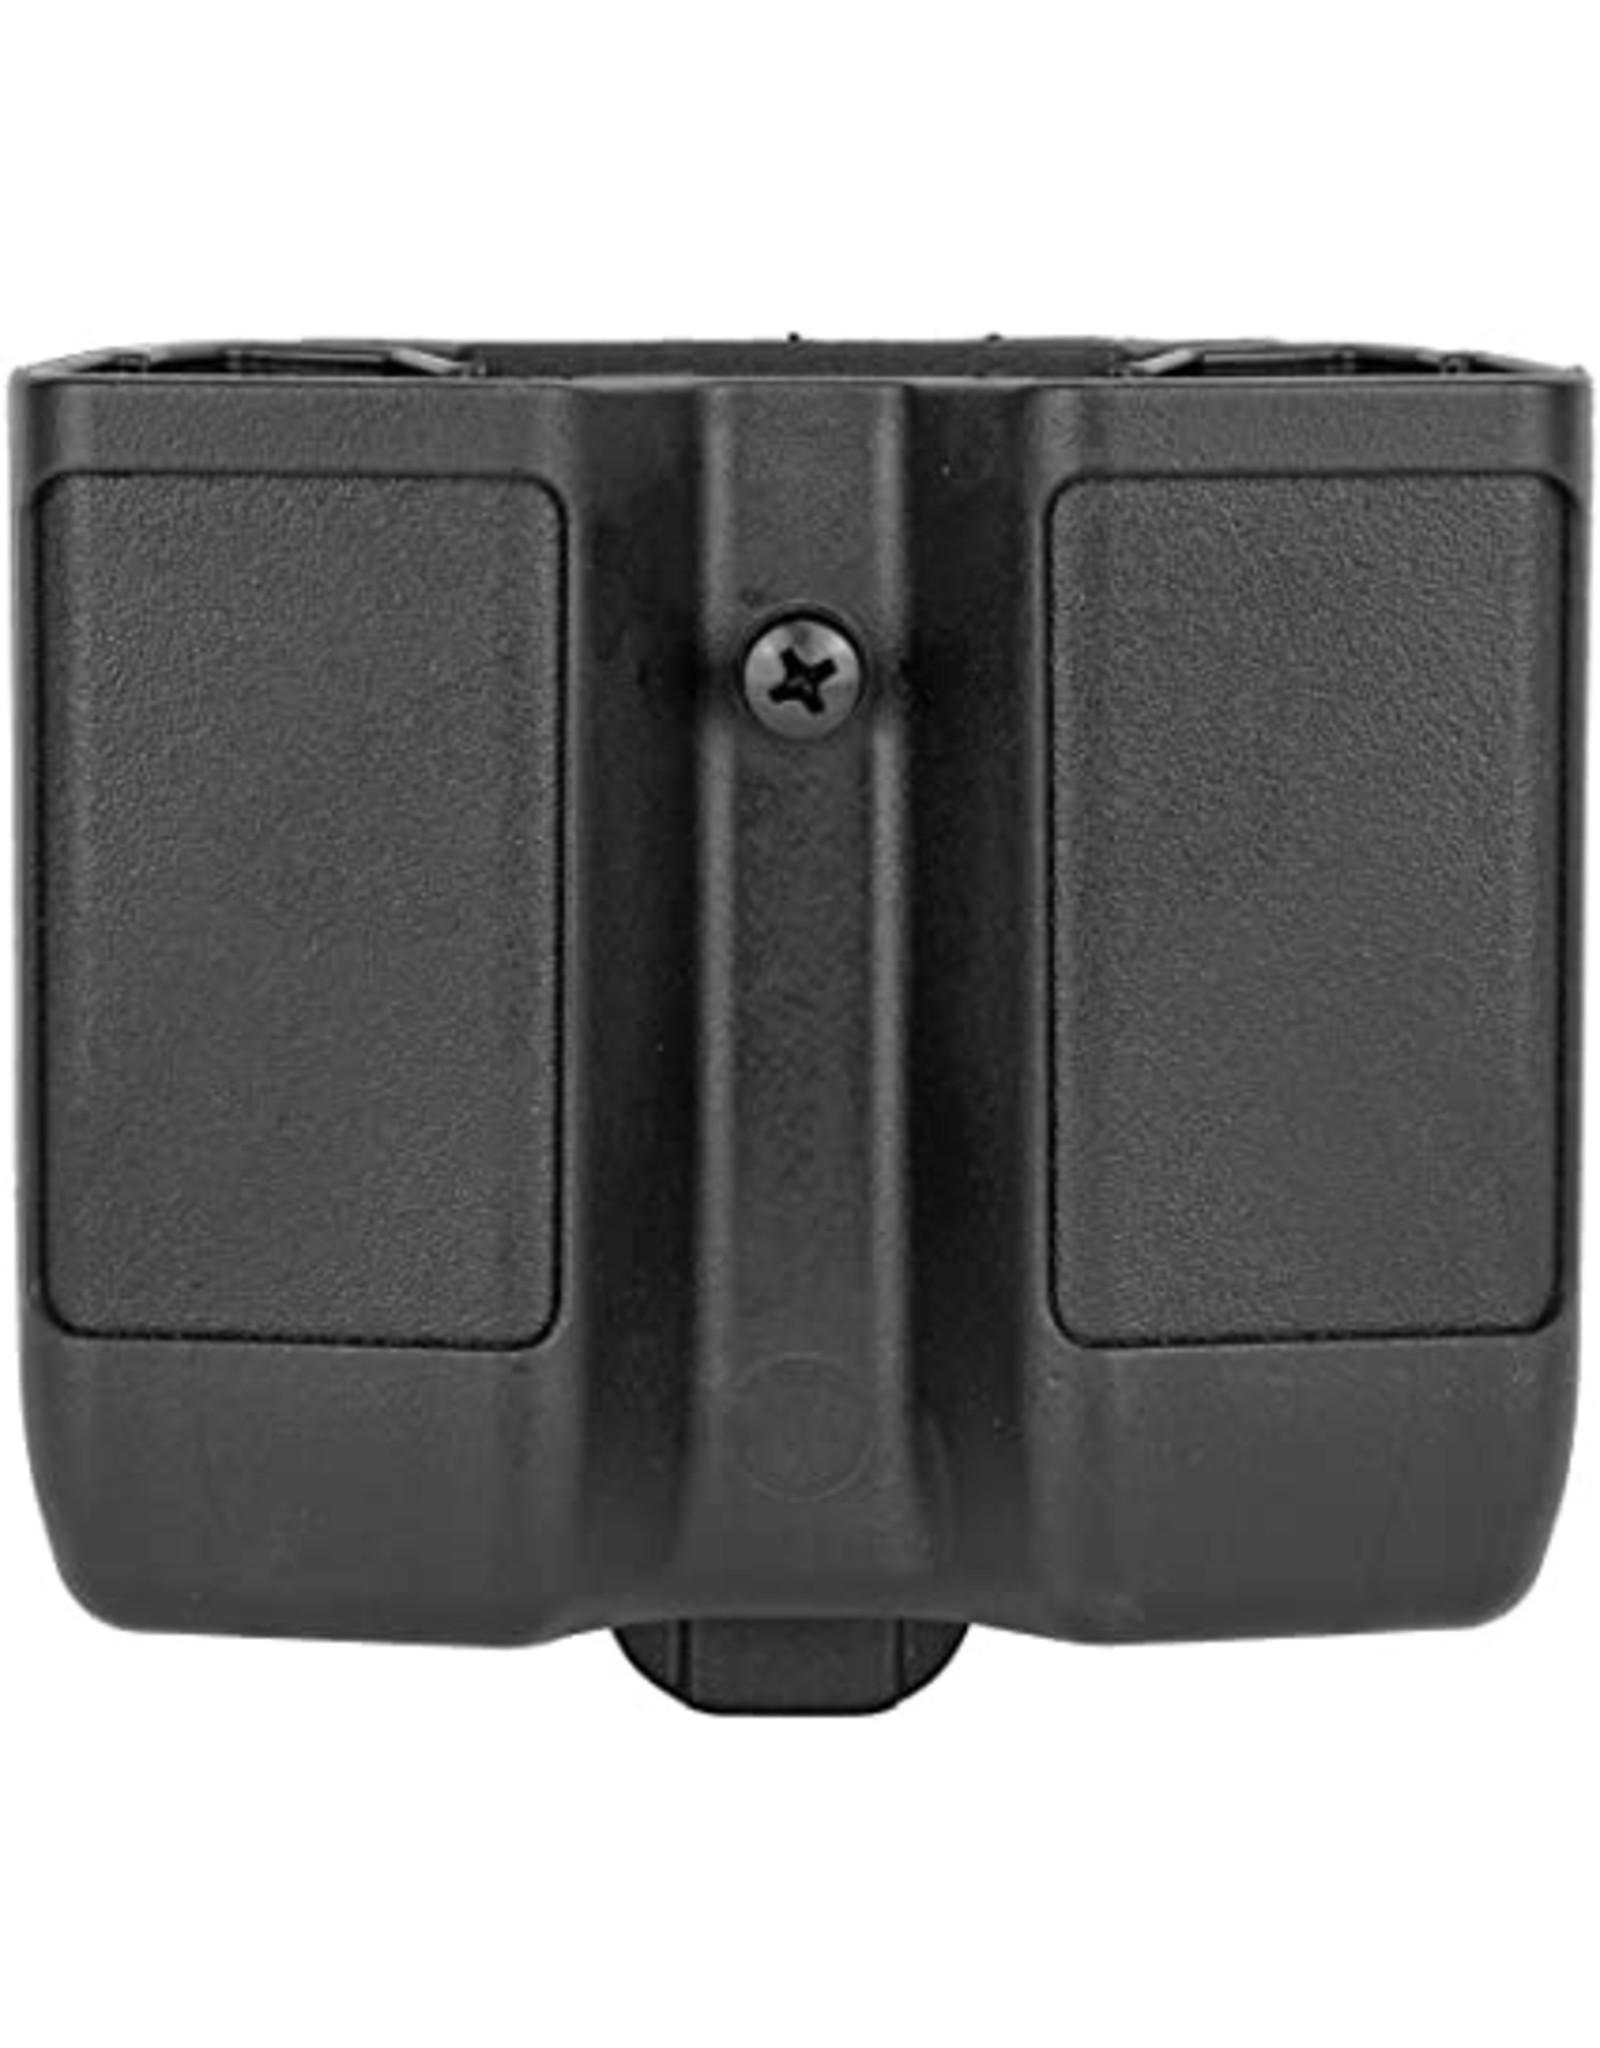 BlackHawk BlackHawk Single Stack Double Mag Case Matte Finish